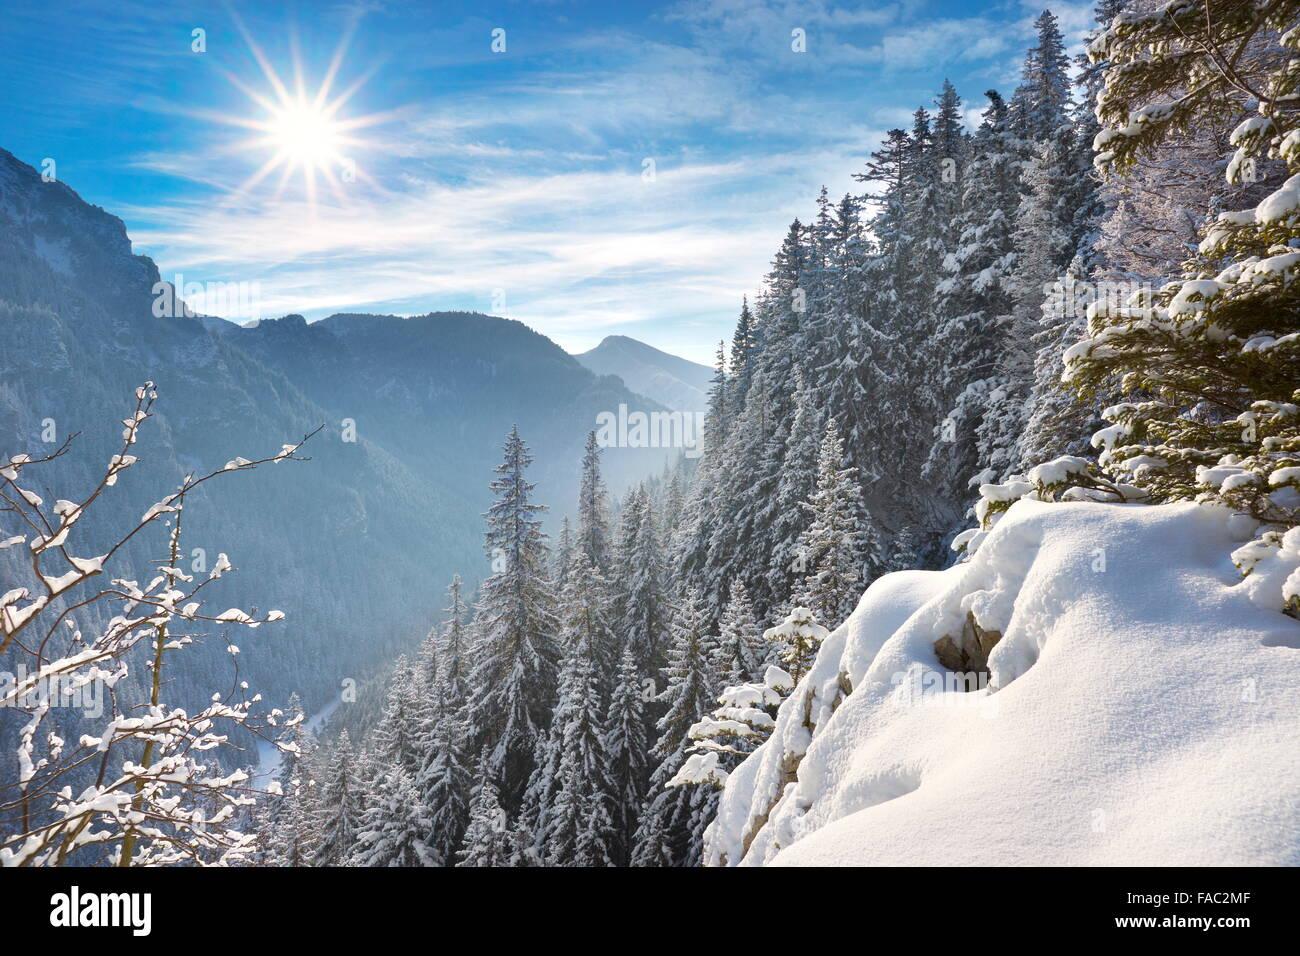 Winter snow landscape, Tatra Mountains, Poland - Stock Image